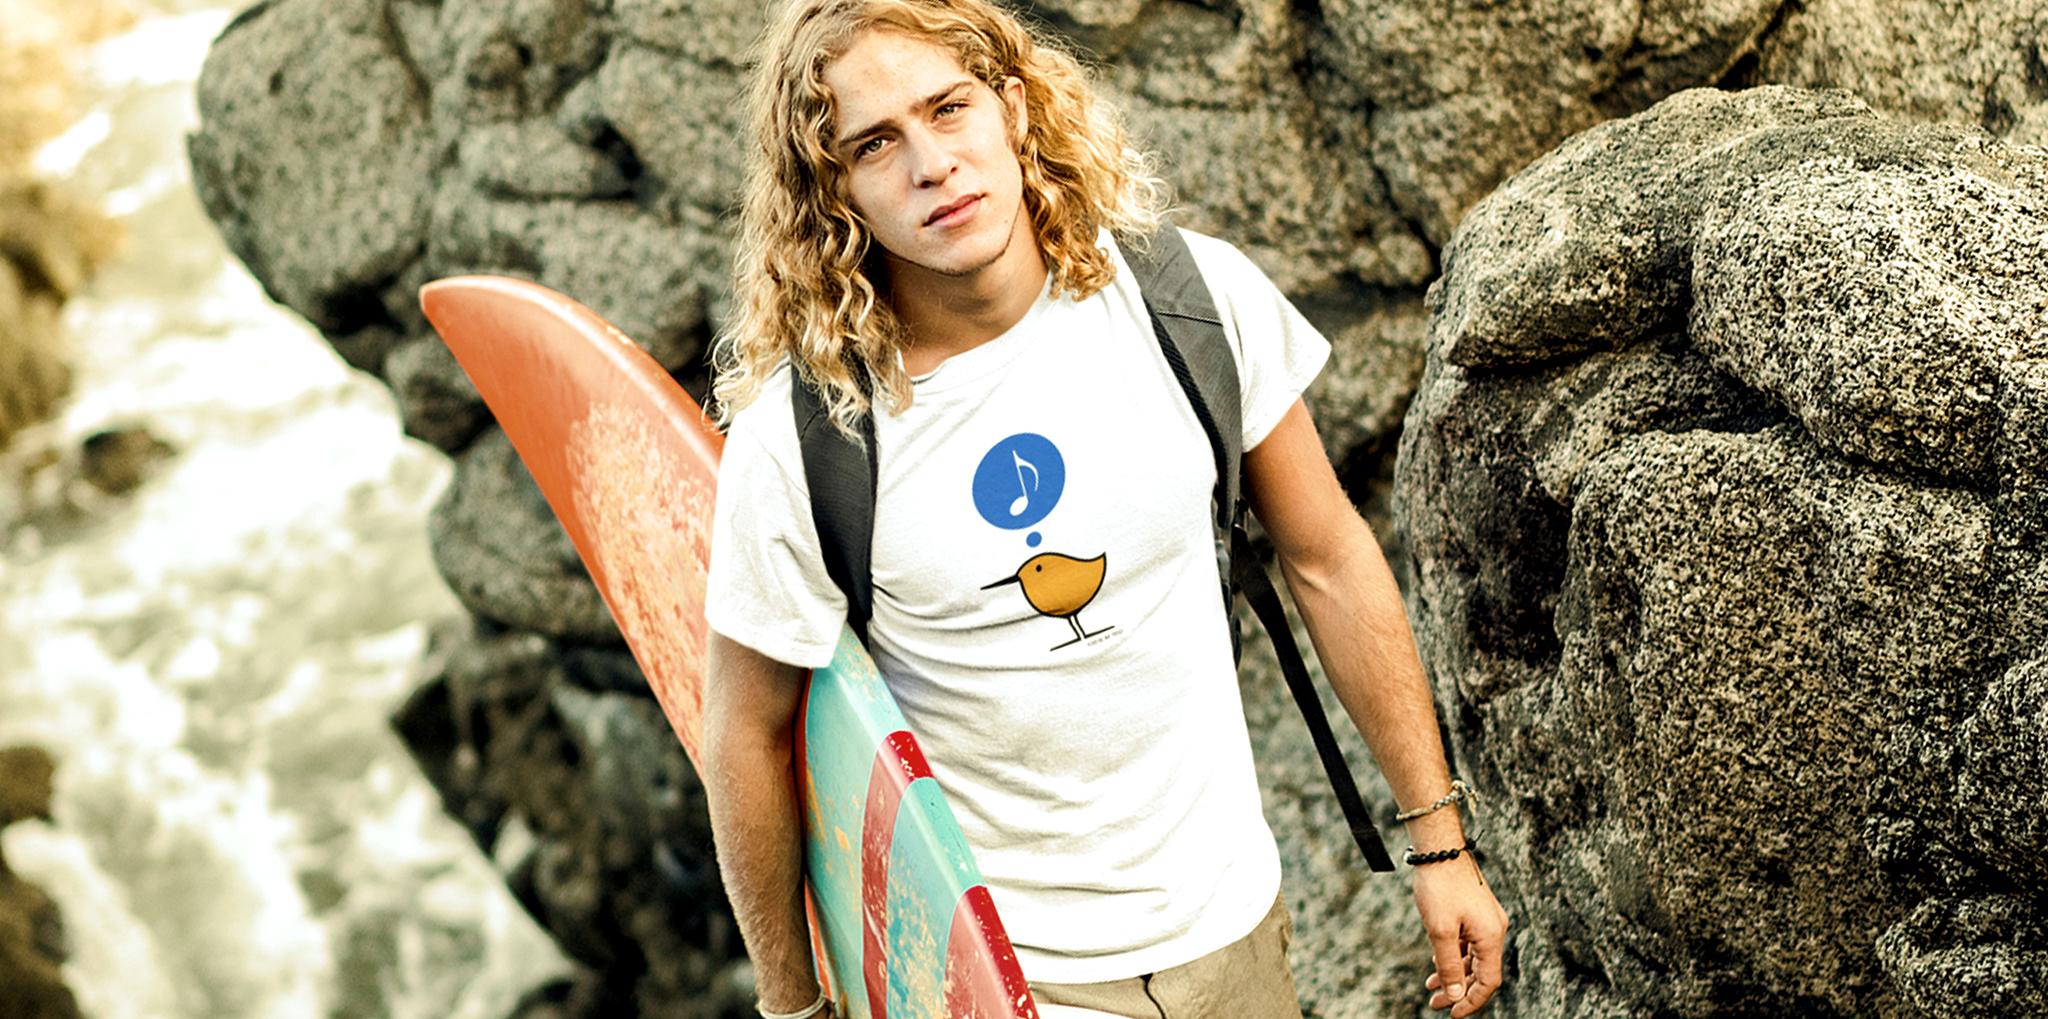 Song_Bird-Original_Tee_Shirts-Beach_Wear_For_All_Ages-PIPPETE-S.jpg